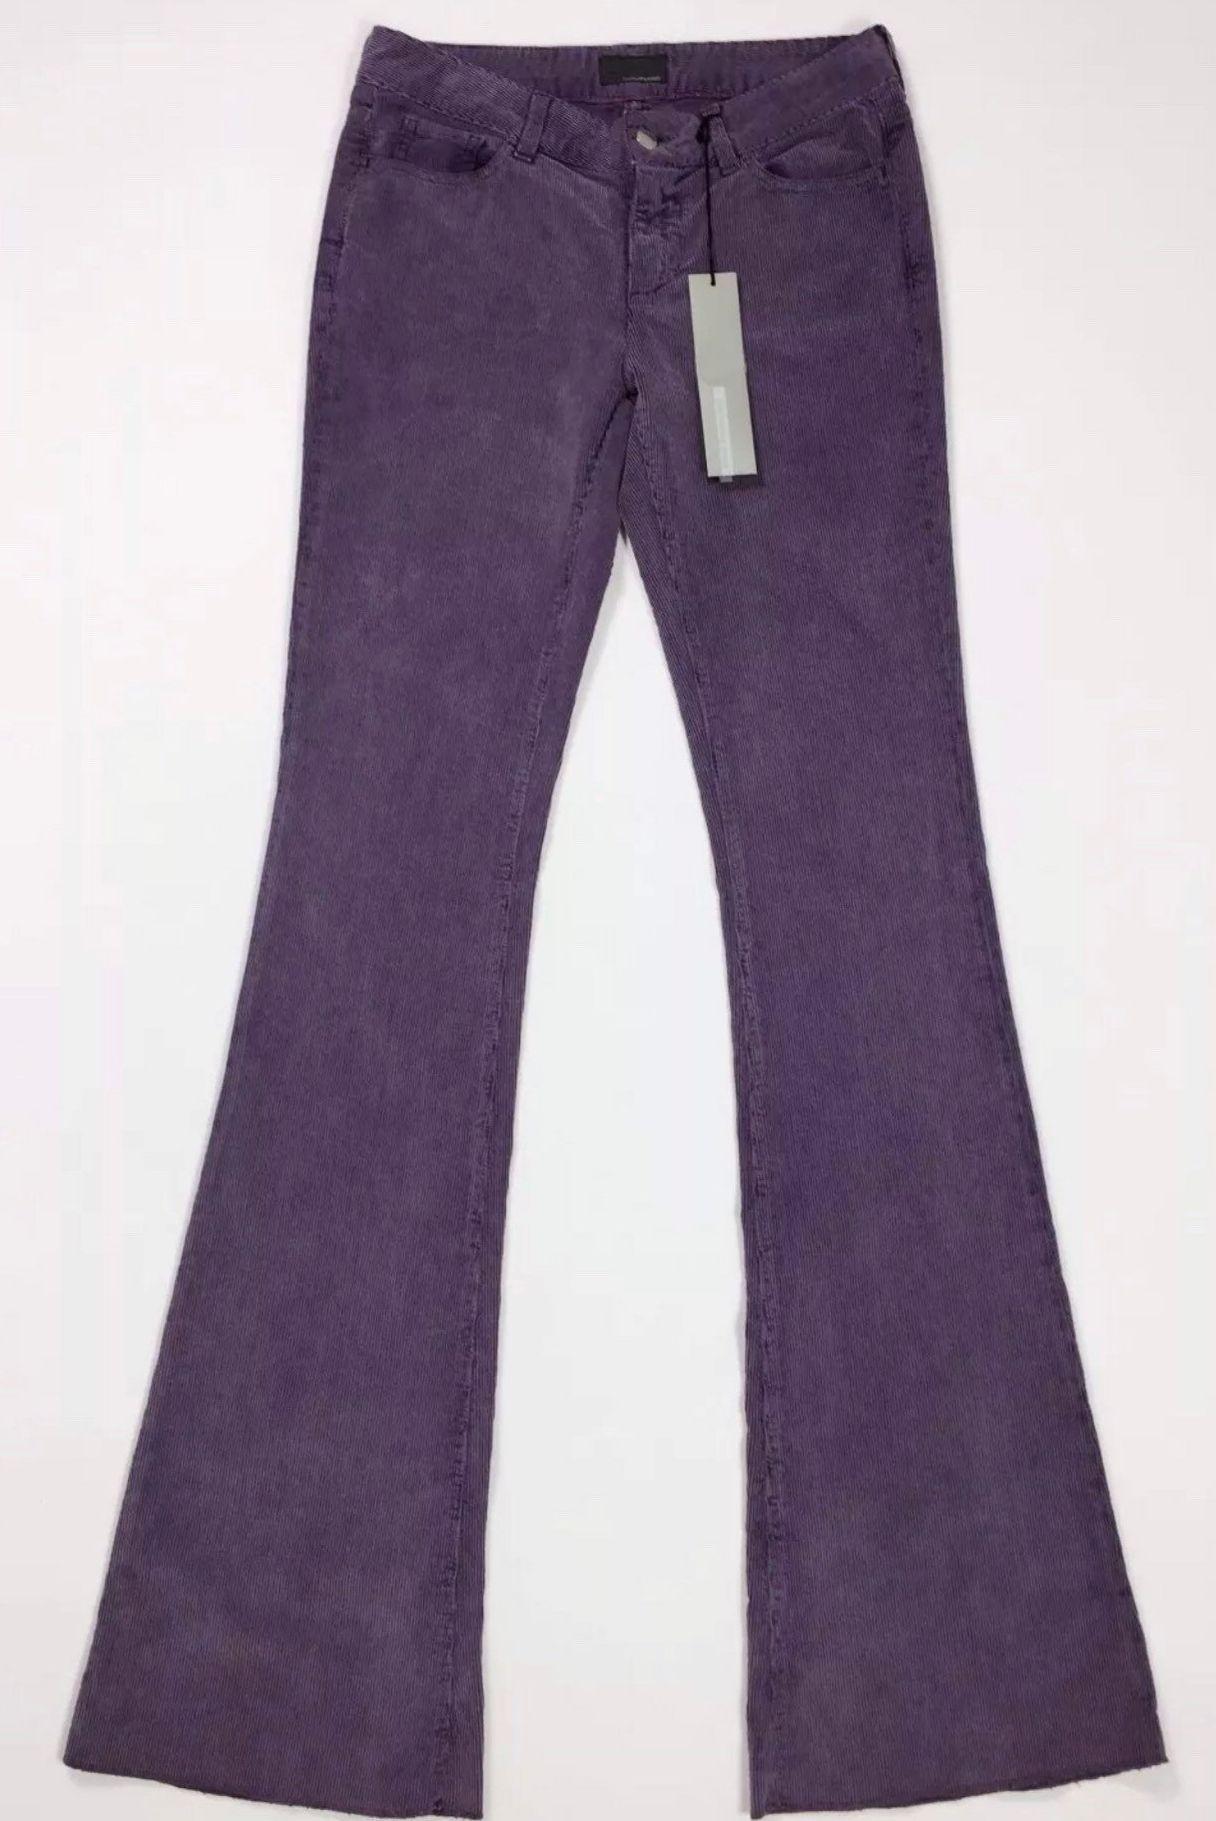 fdec9fe517282 Cool hunting people greta 775 jeans pantalone donna nuovo zampa velluto a  coste vintage retro luxury bootcut T4211  etsy  abbigliamento  donna ...